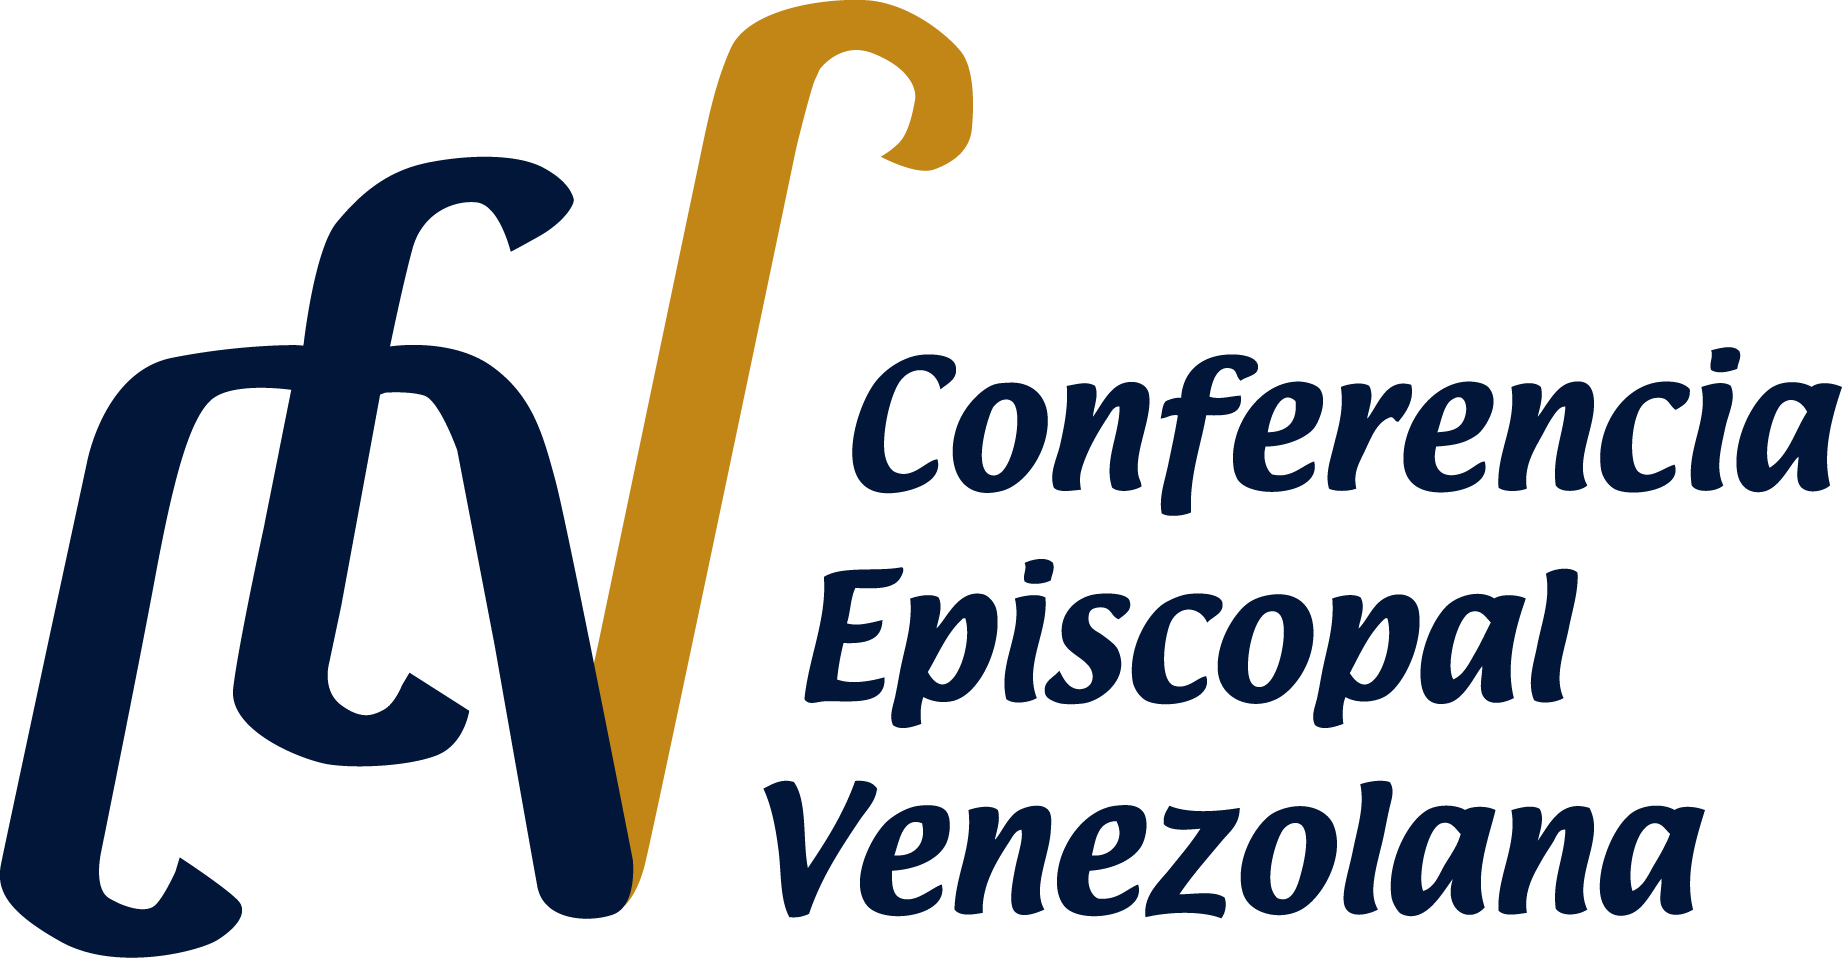 logo-conferencia-episcopal-venezolana